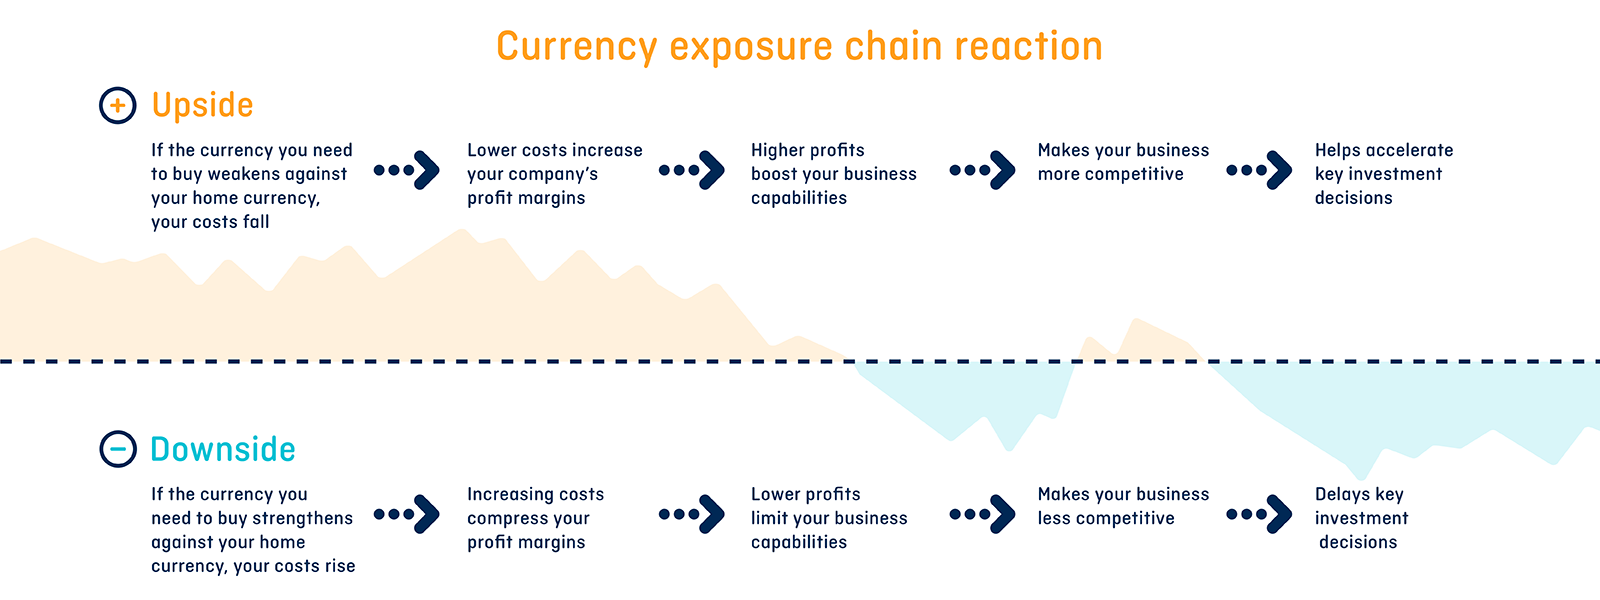 Risk chain reaction